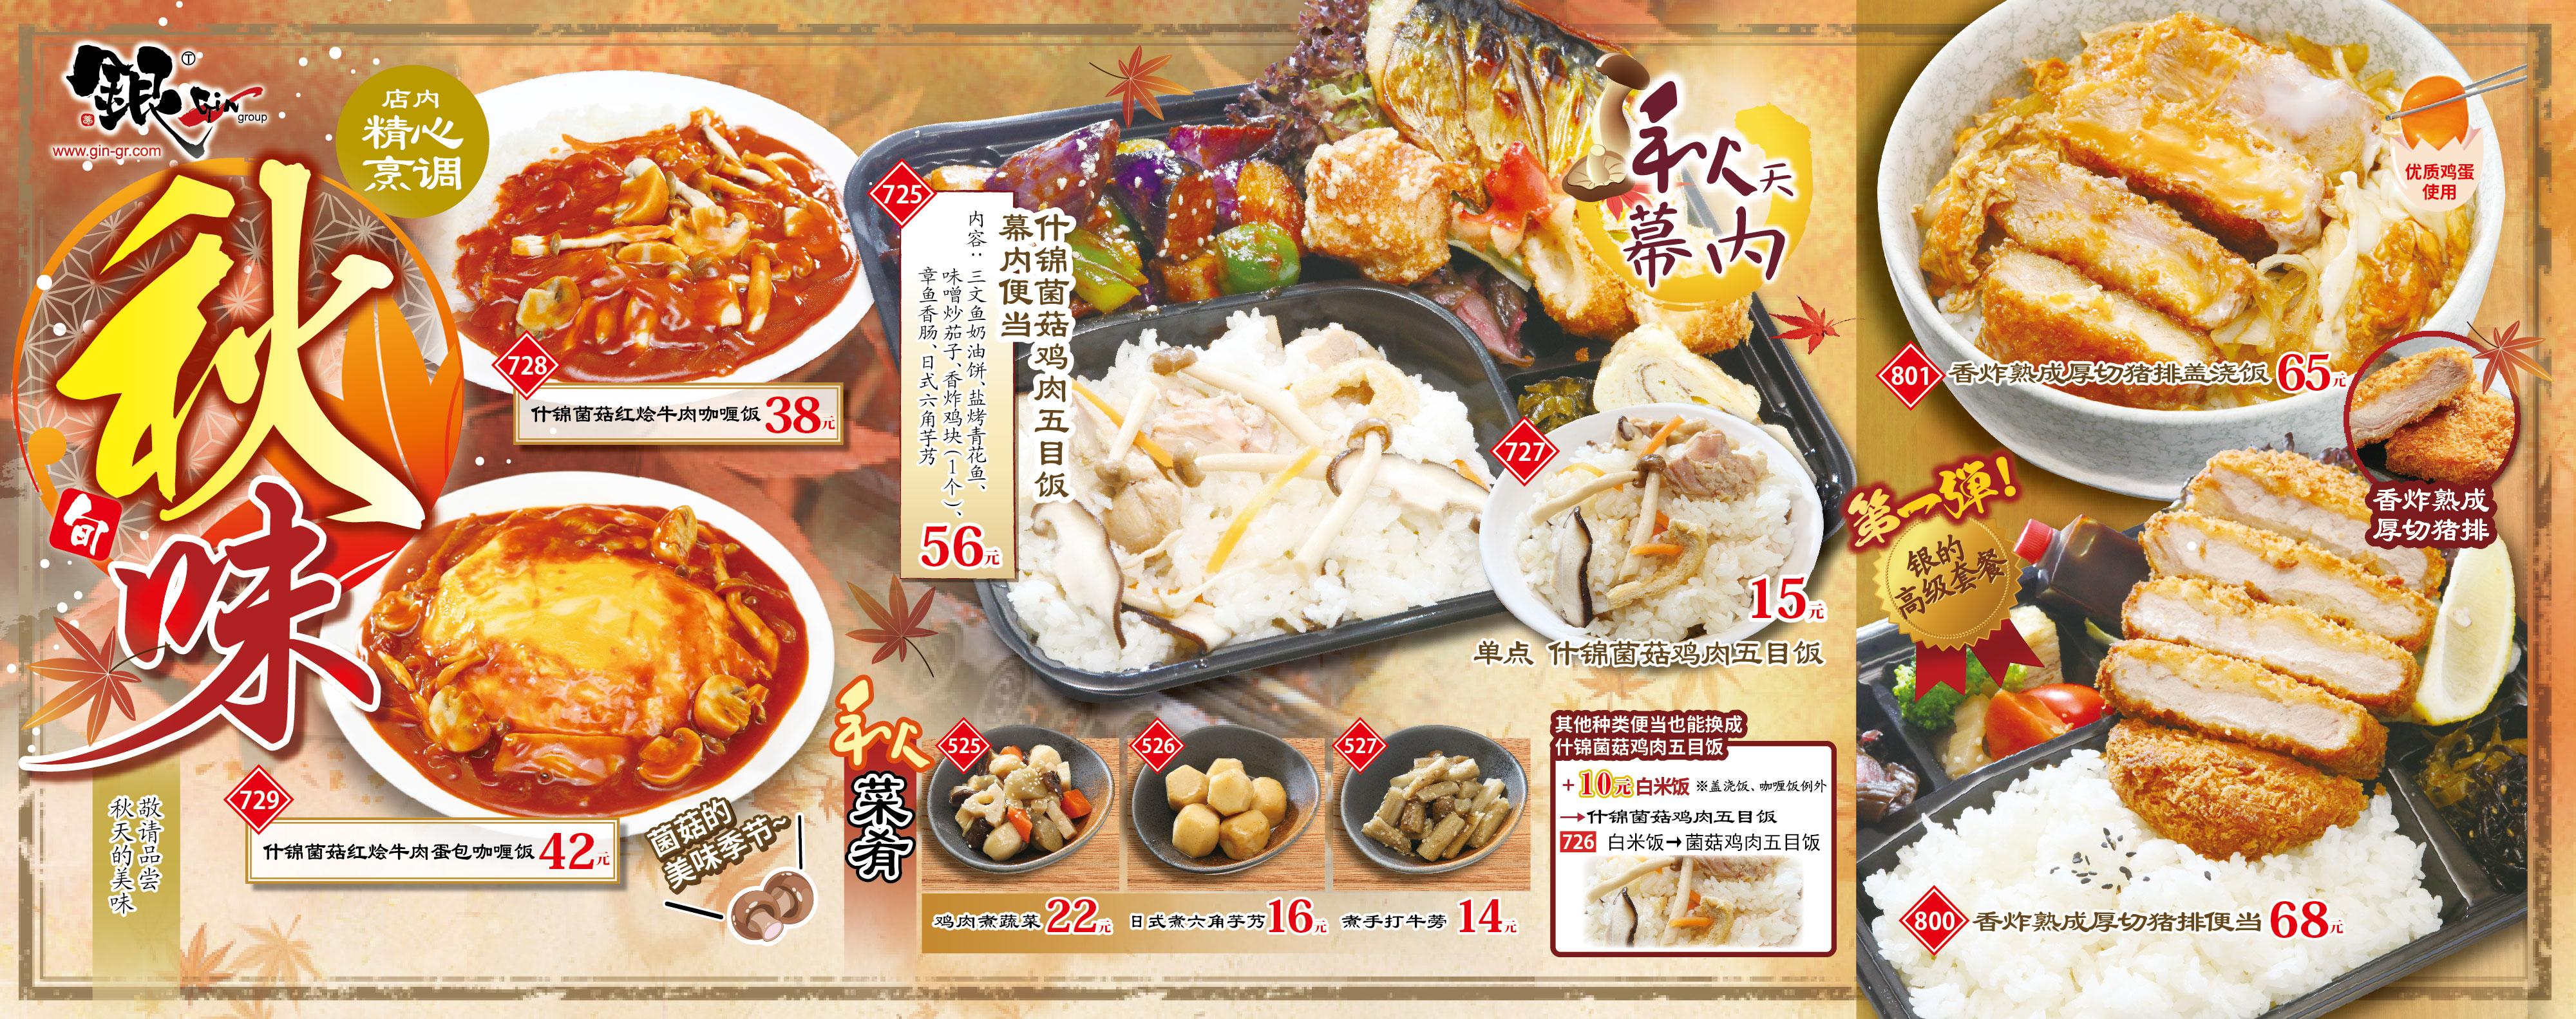 W960pxxH380px_cn-01スライド中国語